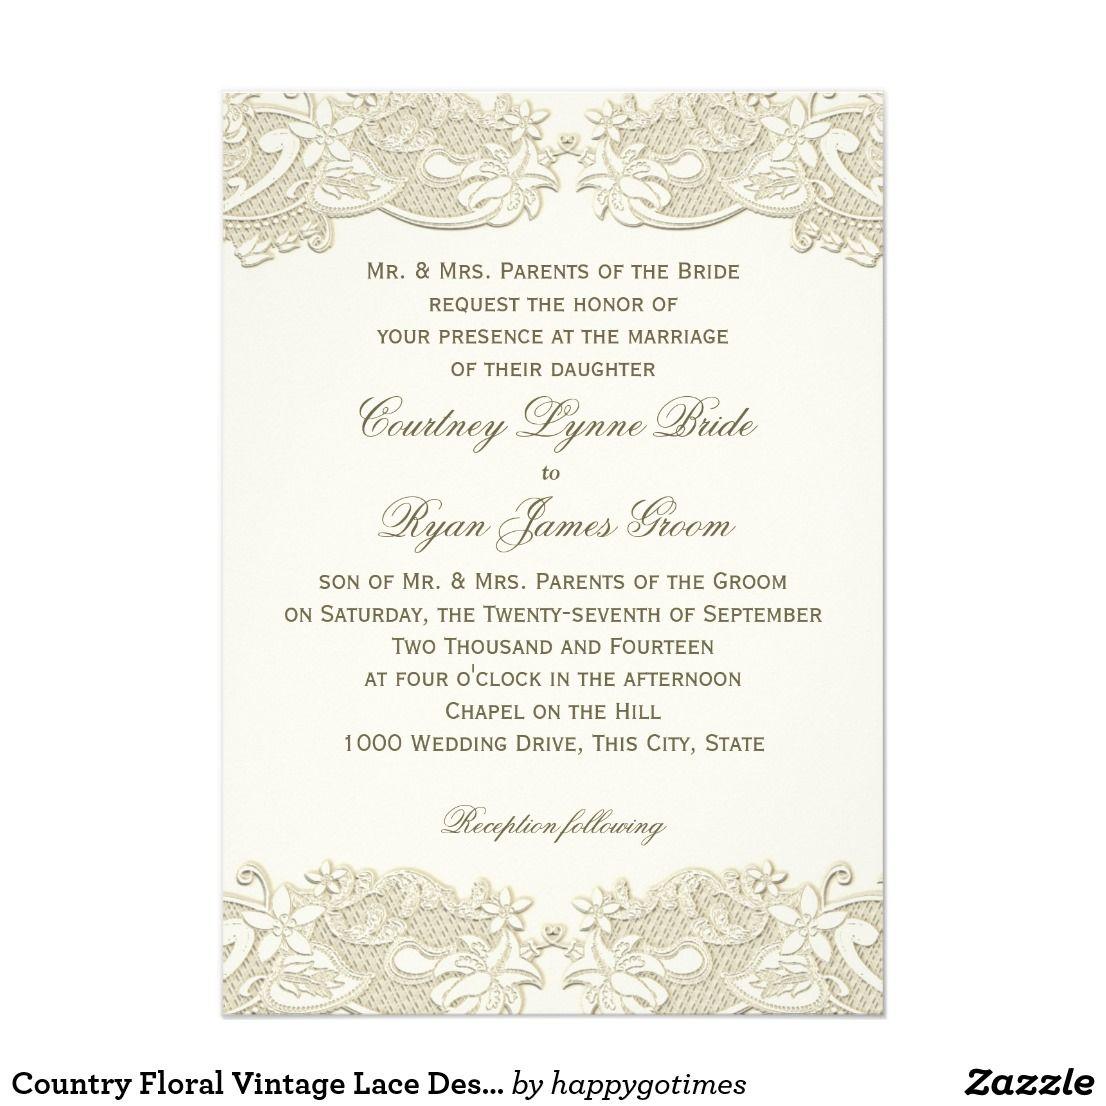 Country Floral Vintage Lace Design Wedding Card | Lace design ...